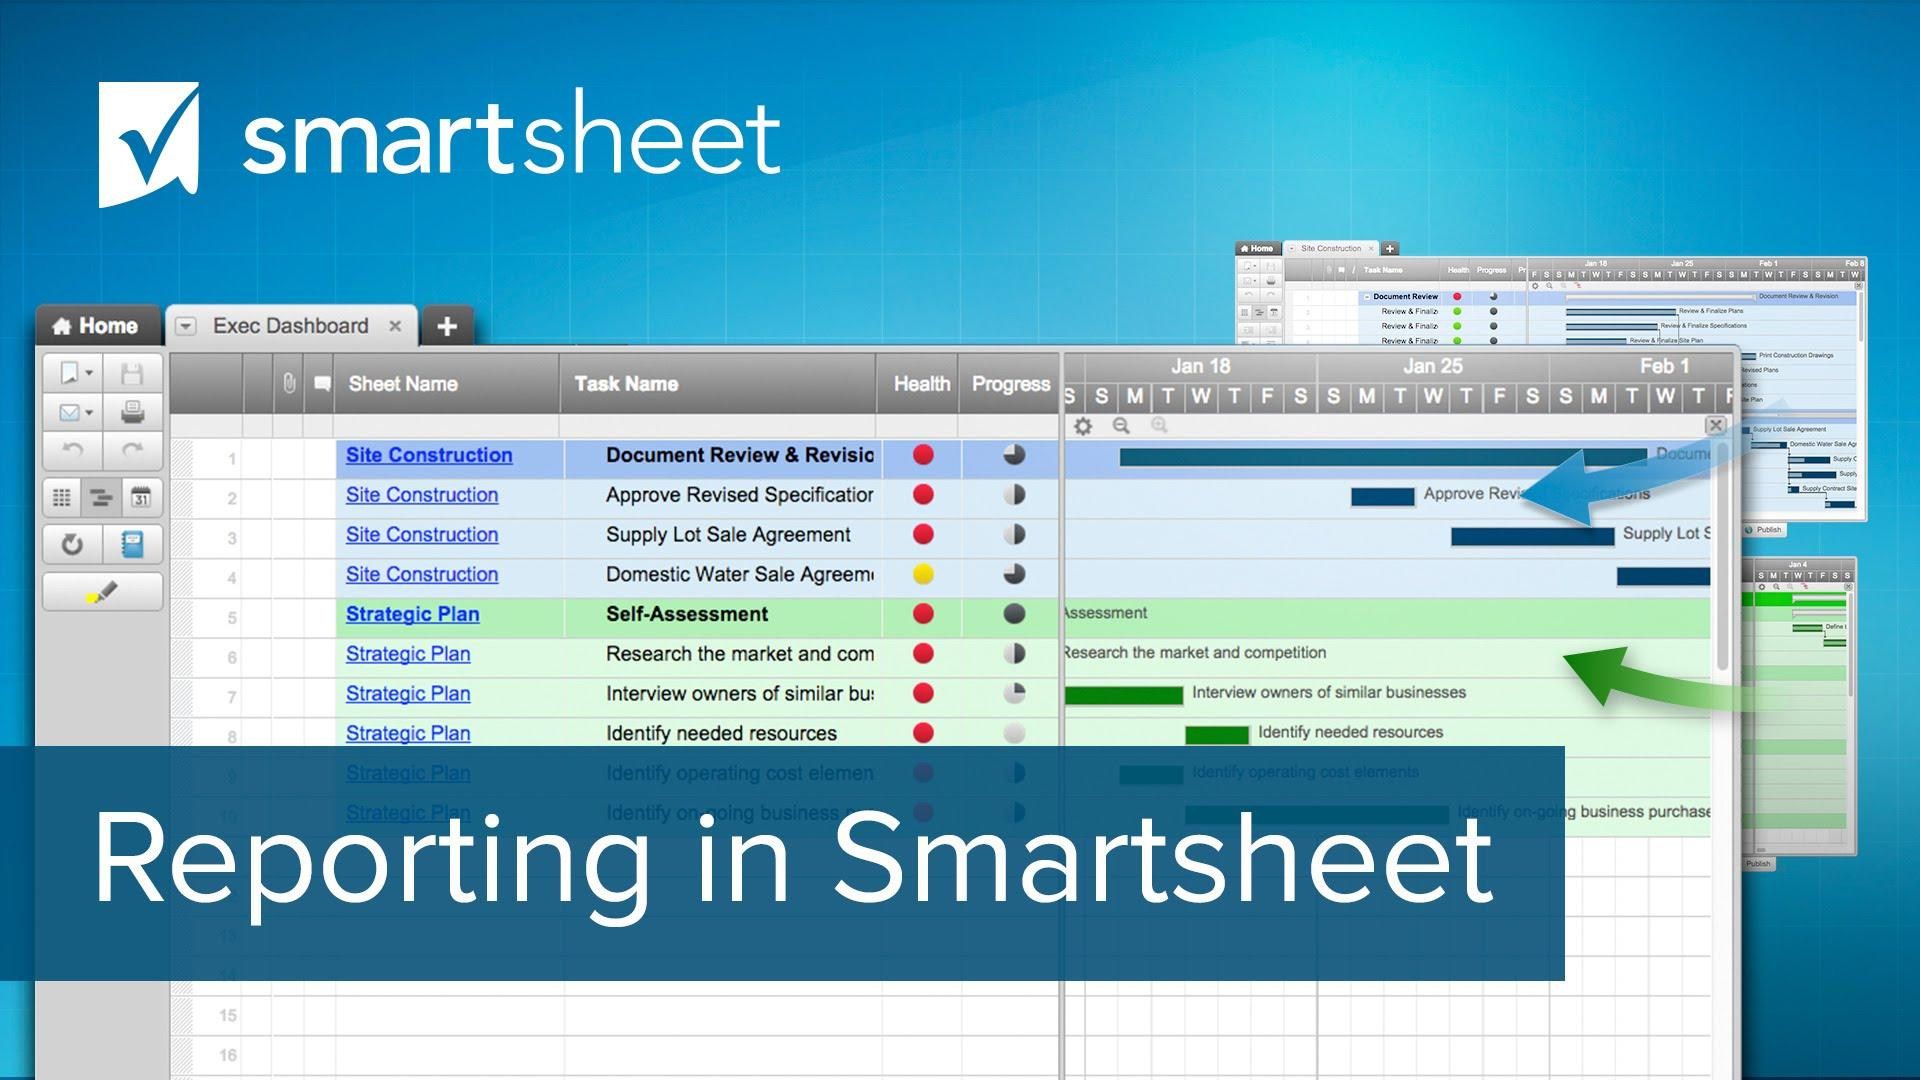 Reporting in Smartsheet